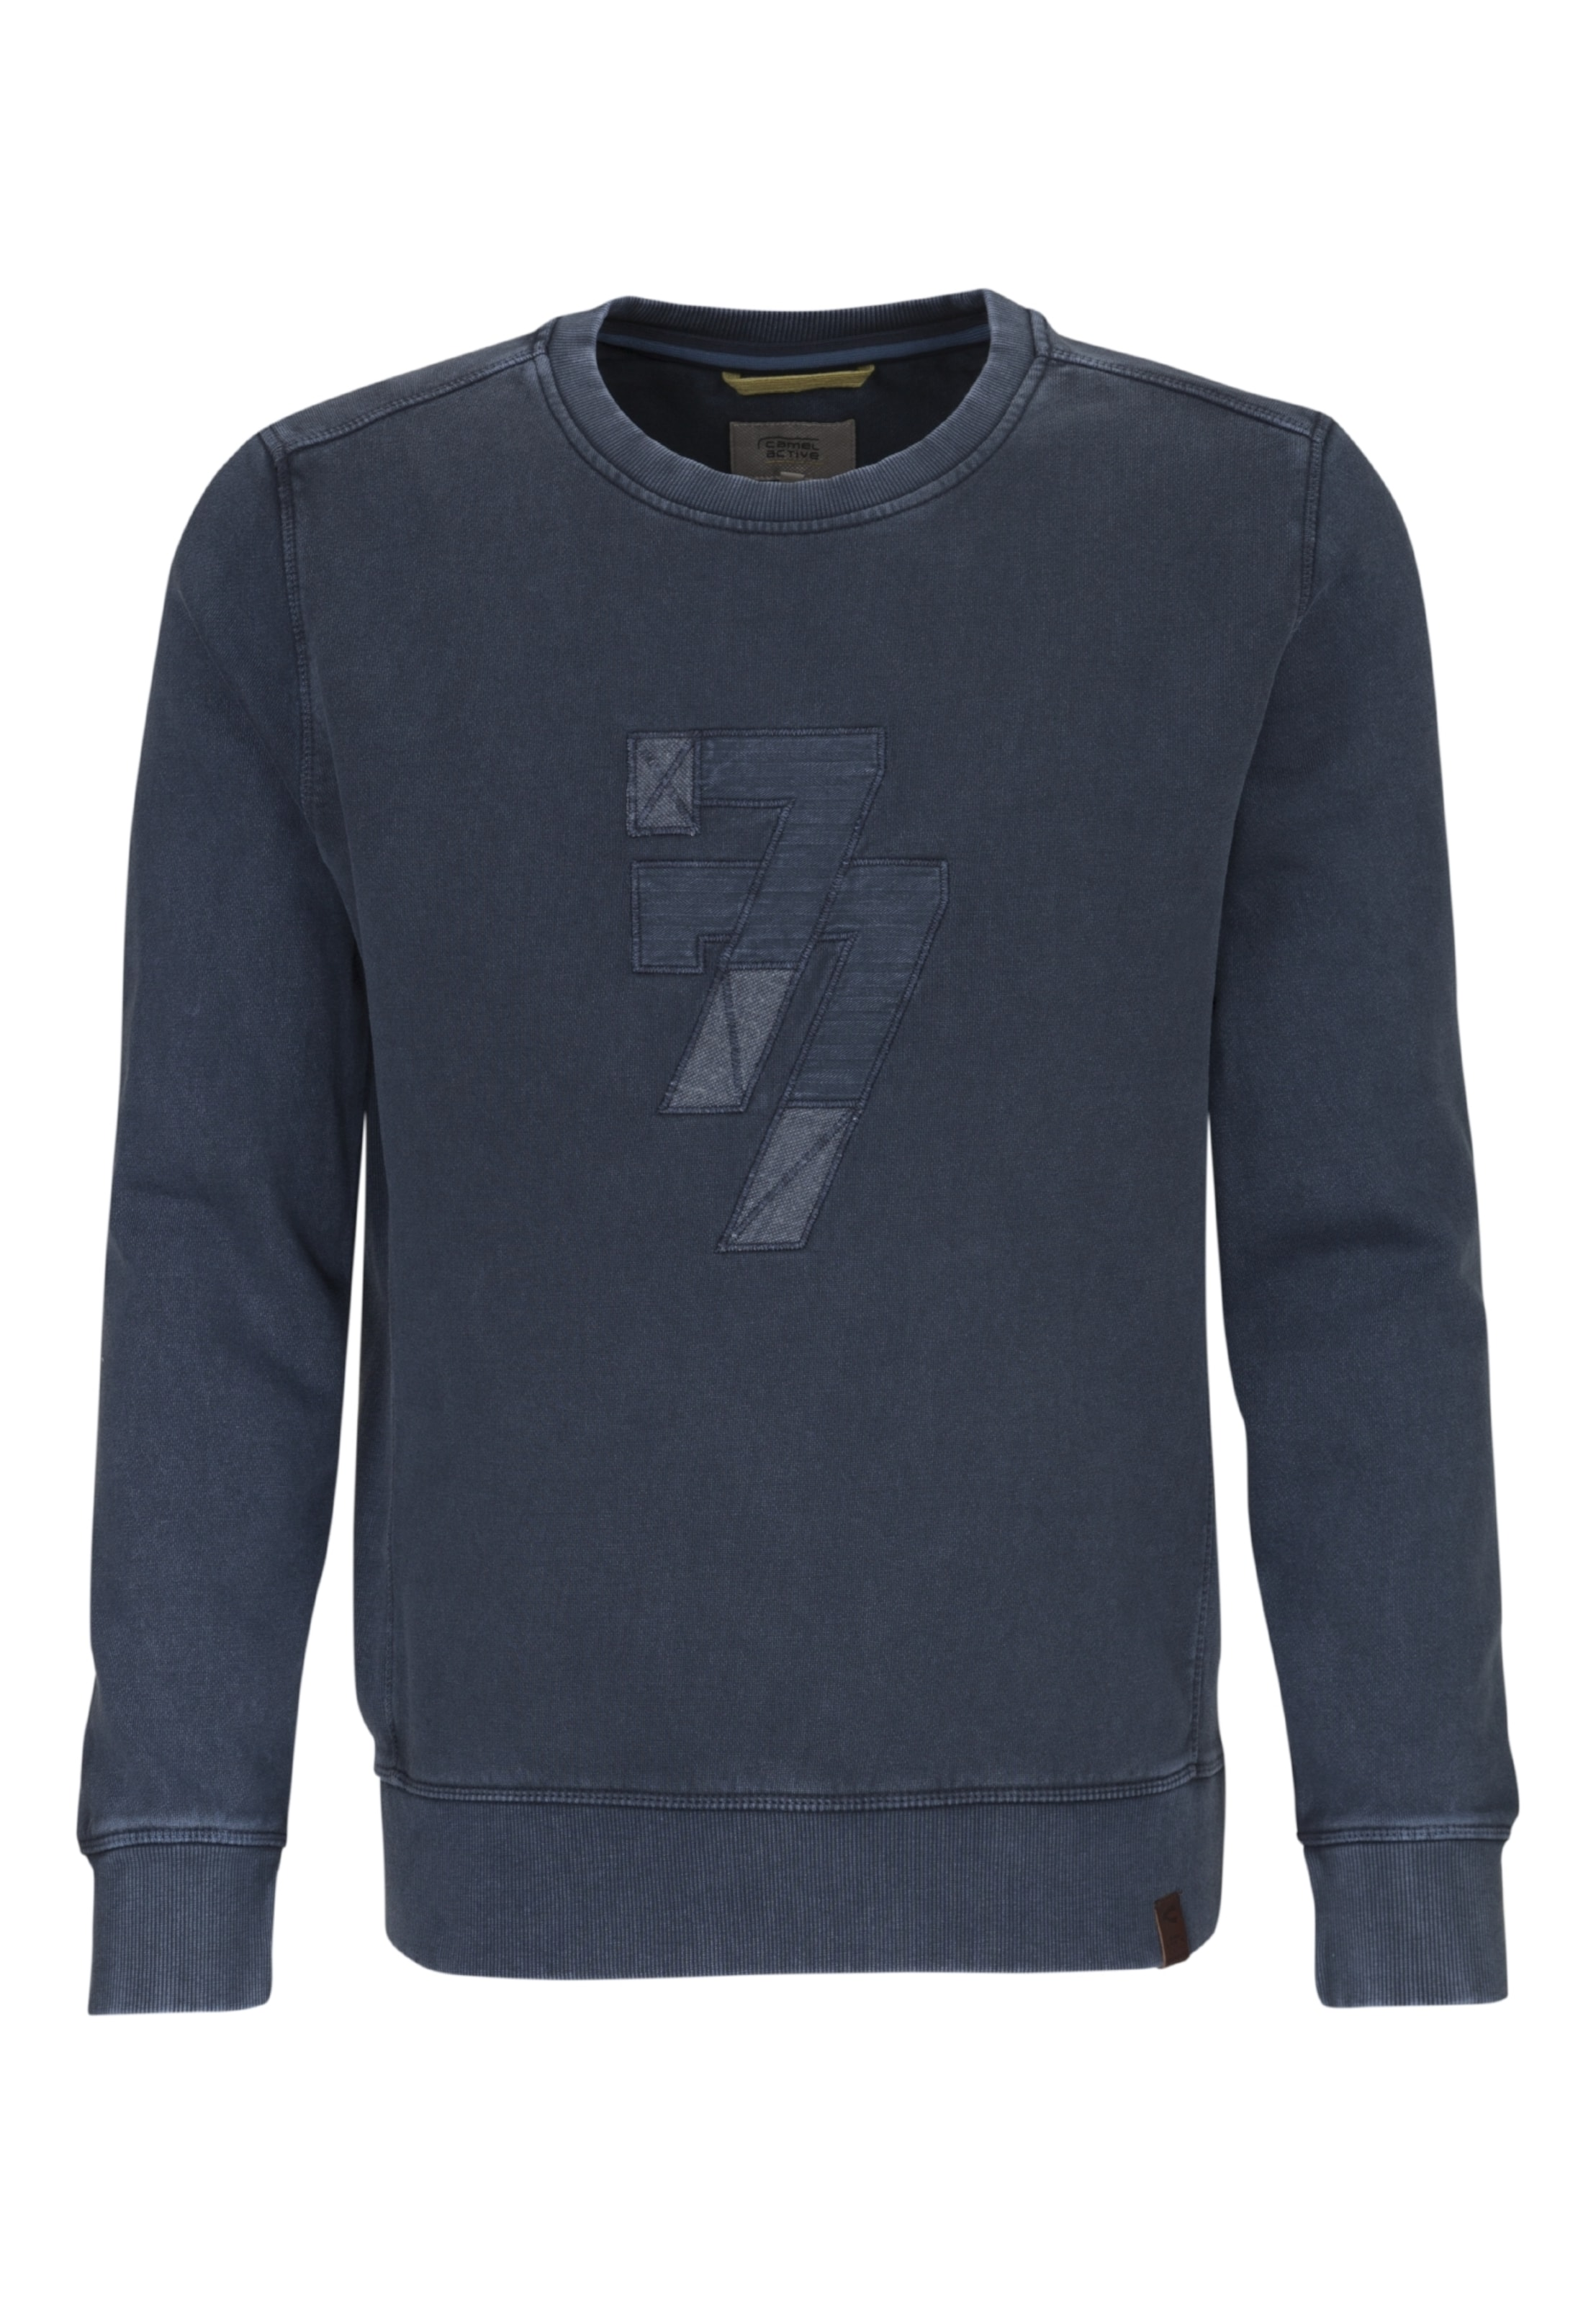 In Camel ' Active Sweat Dunkelblau shirts Kl1J3TcF